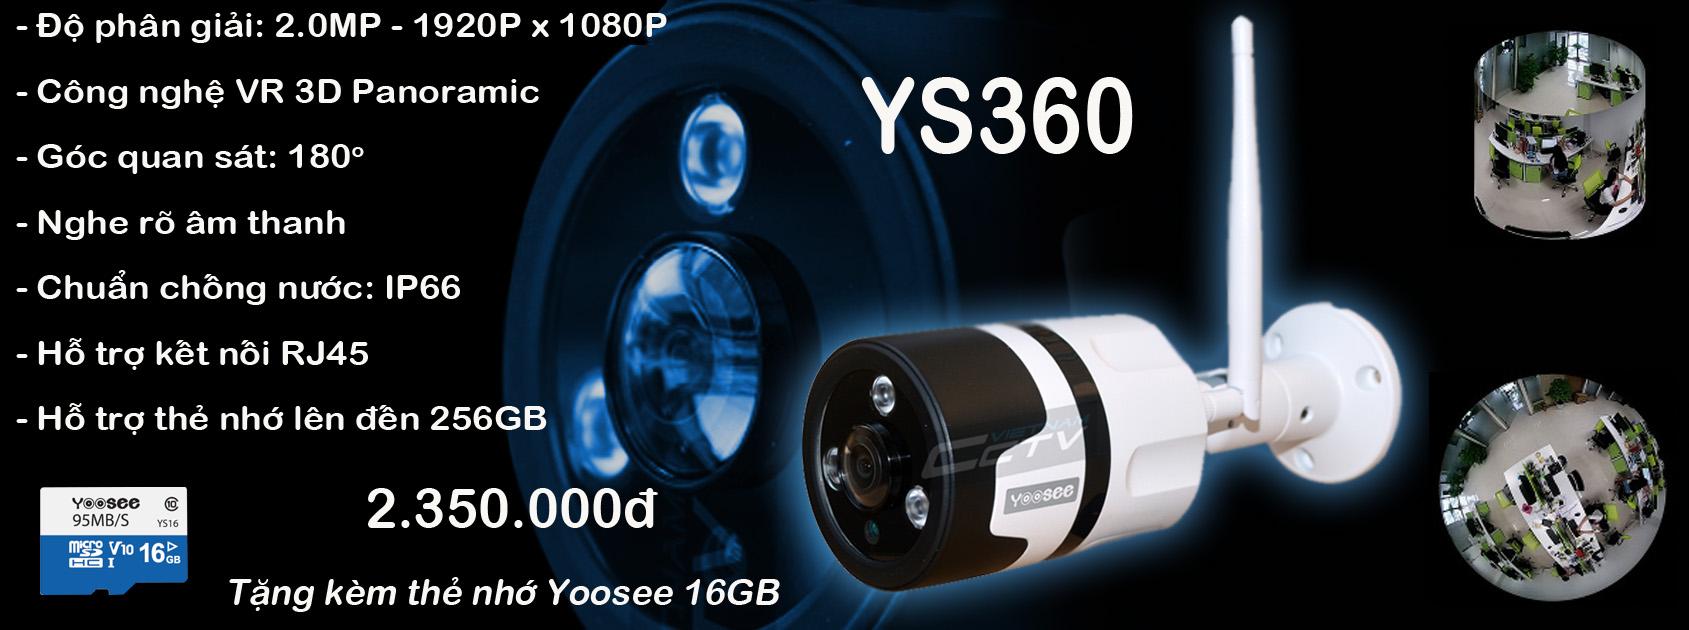 camera yoosee ys360